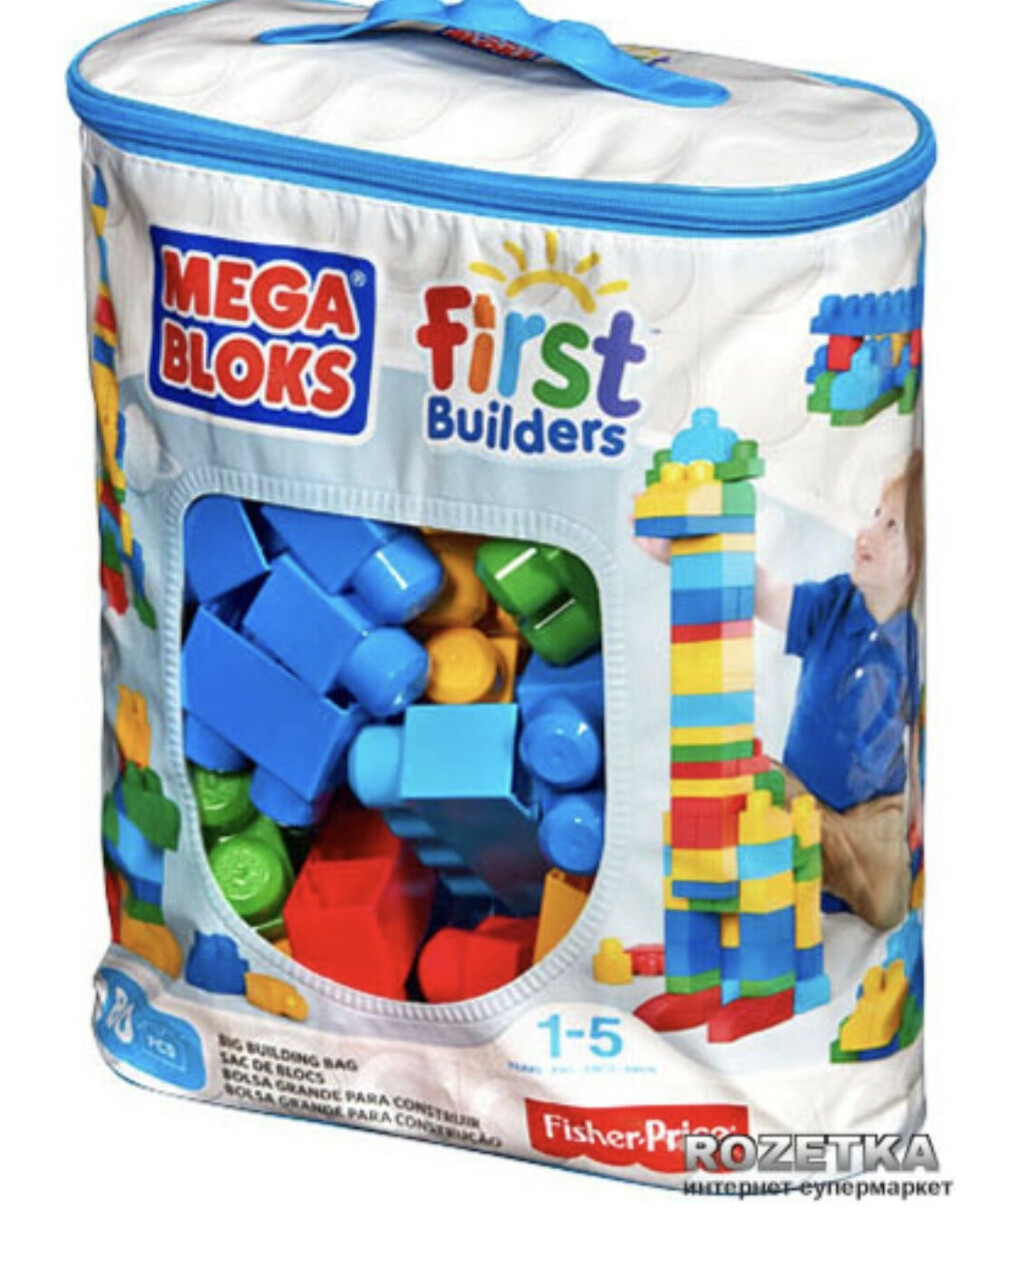 Конструктор Mega blocks Fisher Price